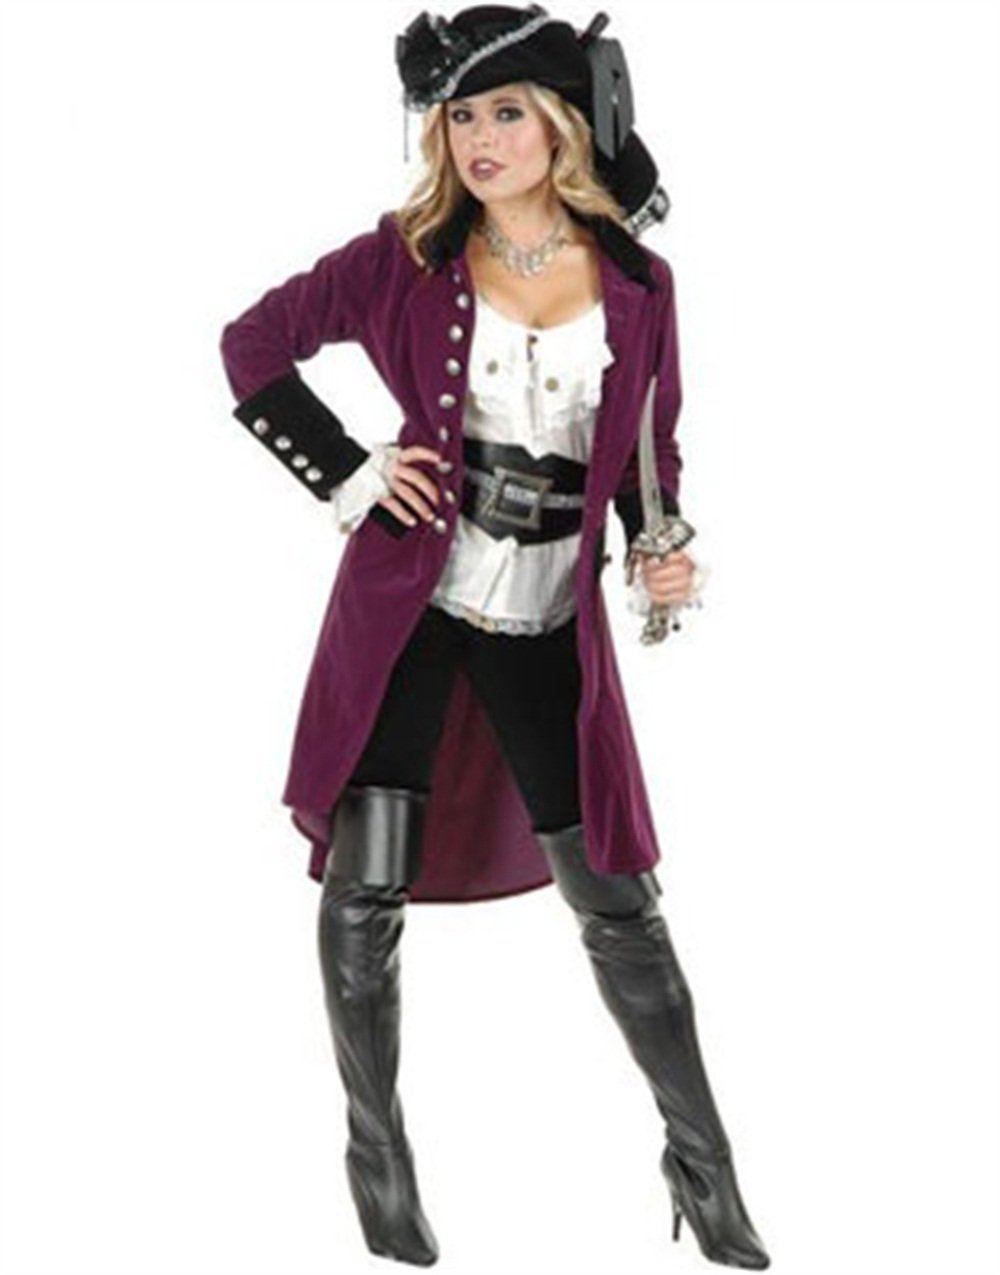 Amazon.com Womens Pirate Vixen Plumberry And Black Velvet Long Jacket Coat Costume Accessories Clothing  sc 1 st  Pinterest & Amazon.com: Womens Pirate Vixen Plumberry And Black Velvet Long ...